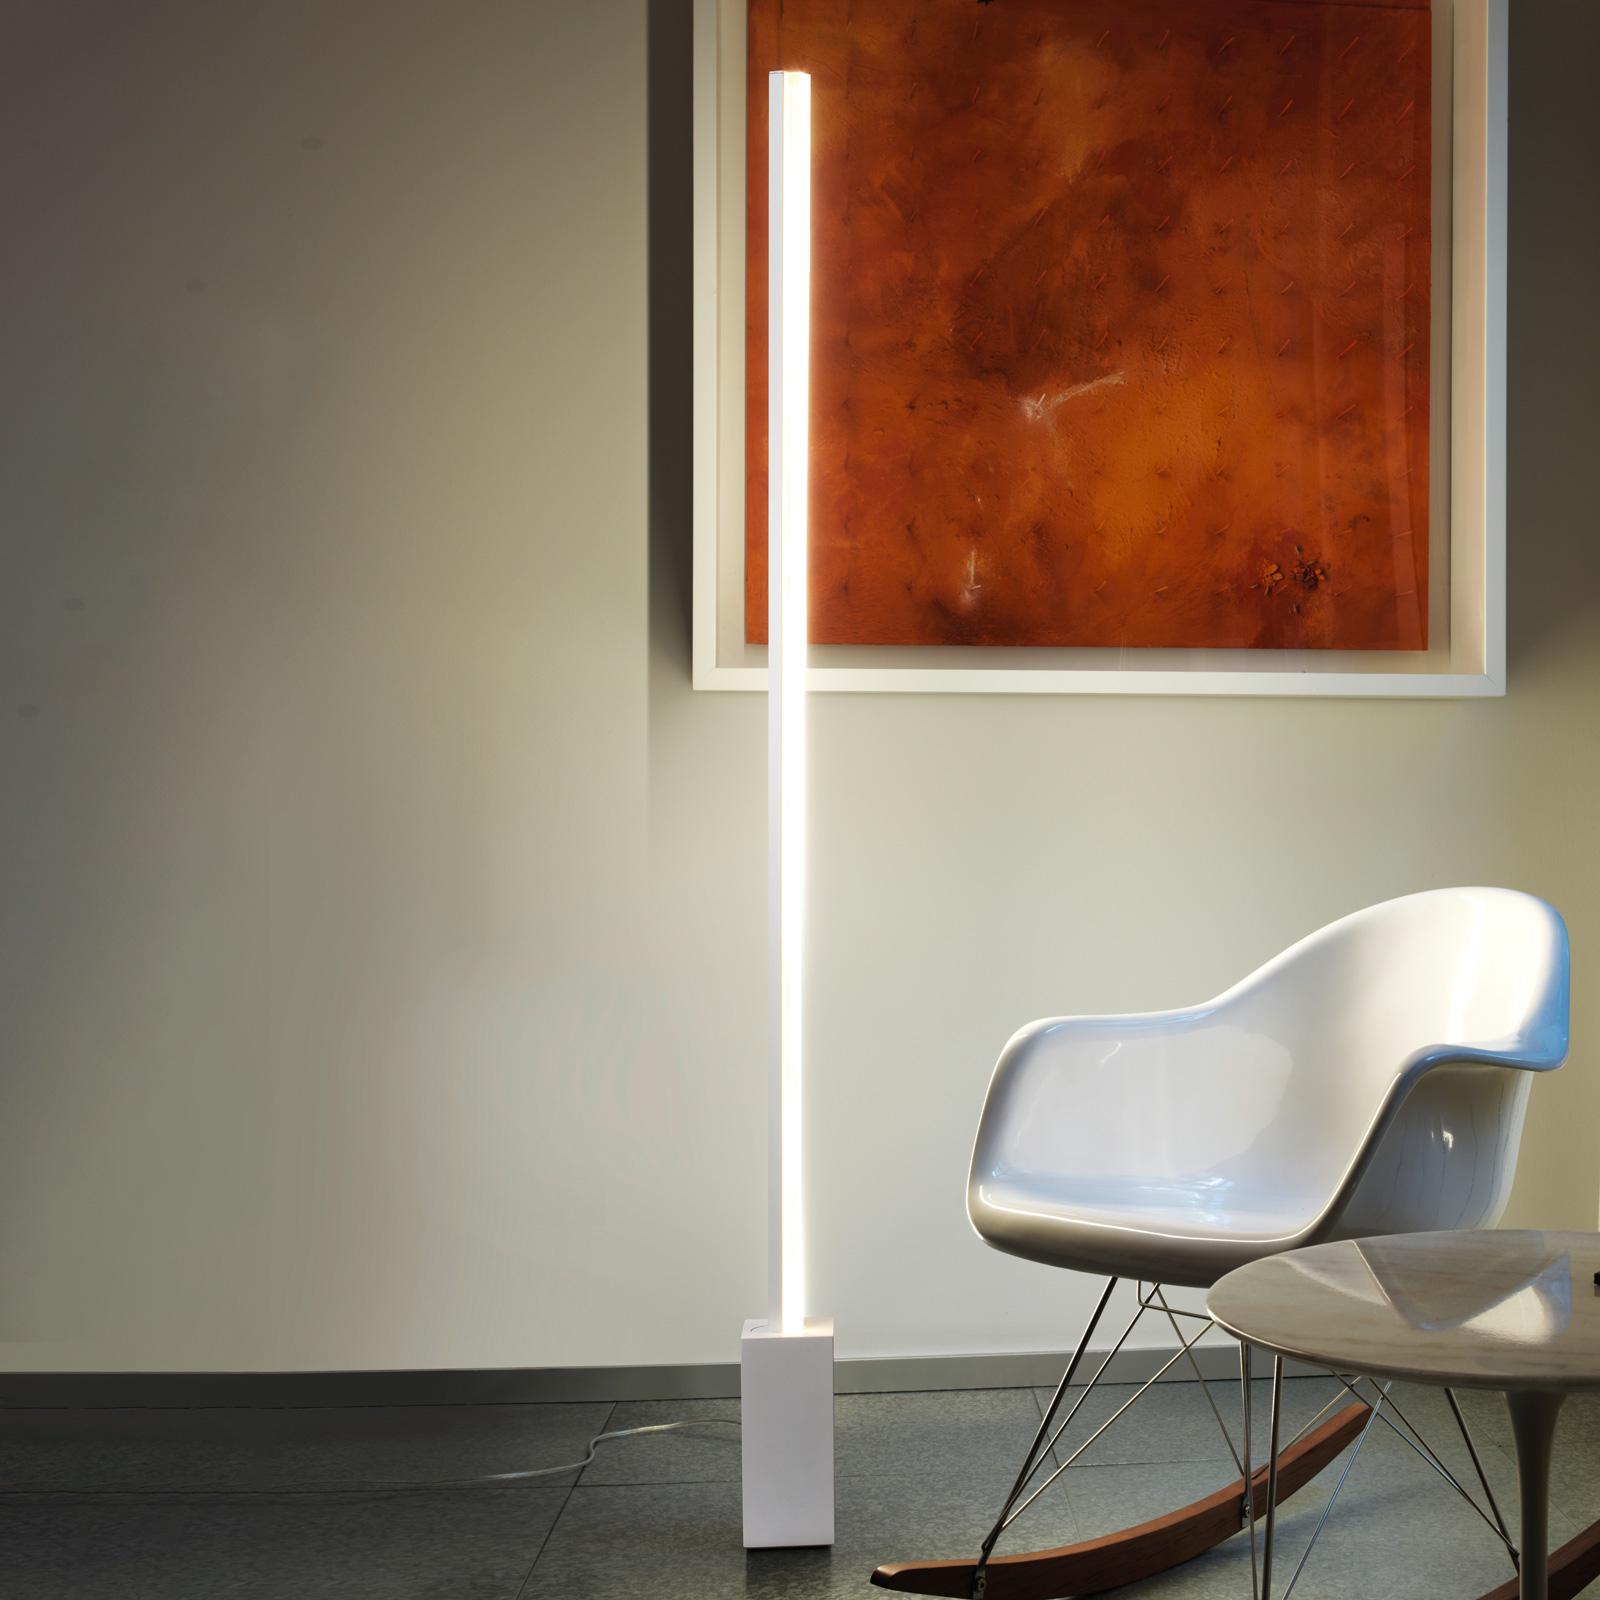 Grok Circ lampa stojąca LED, aluminium, ściemniacz